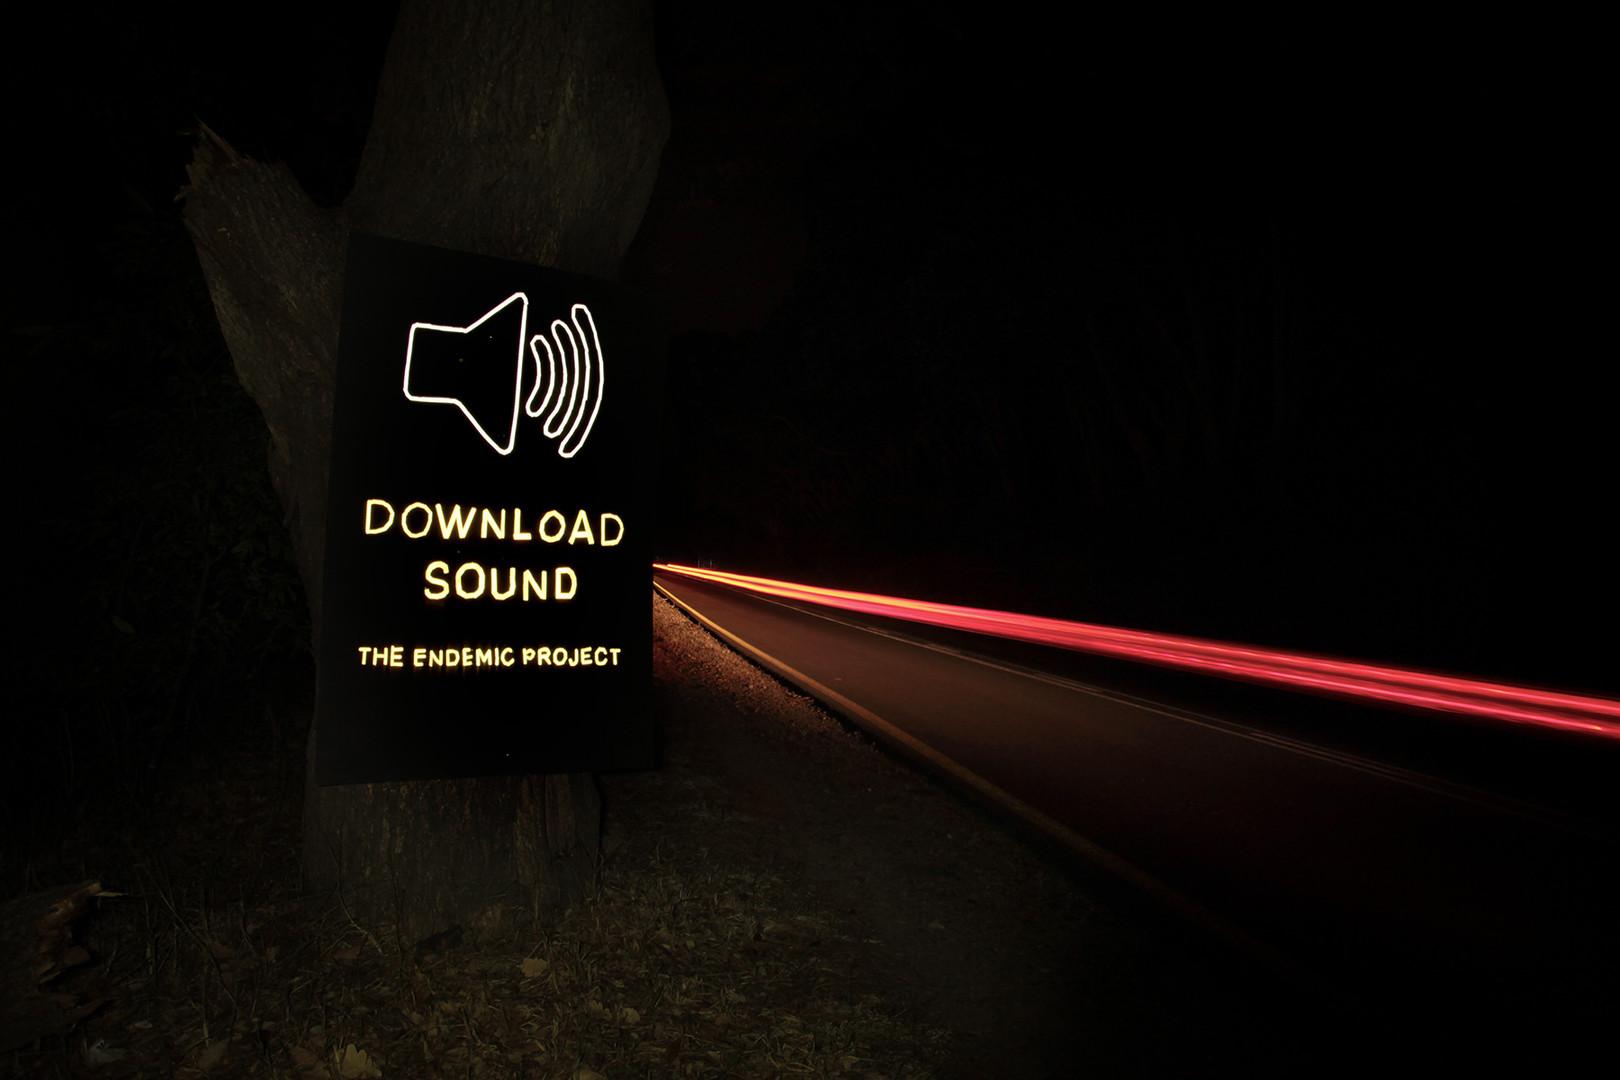 download-sound sign